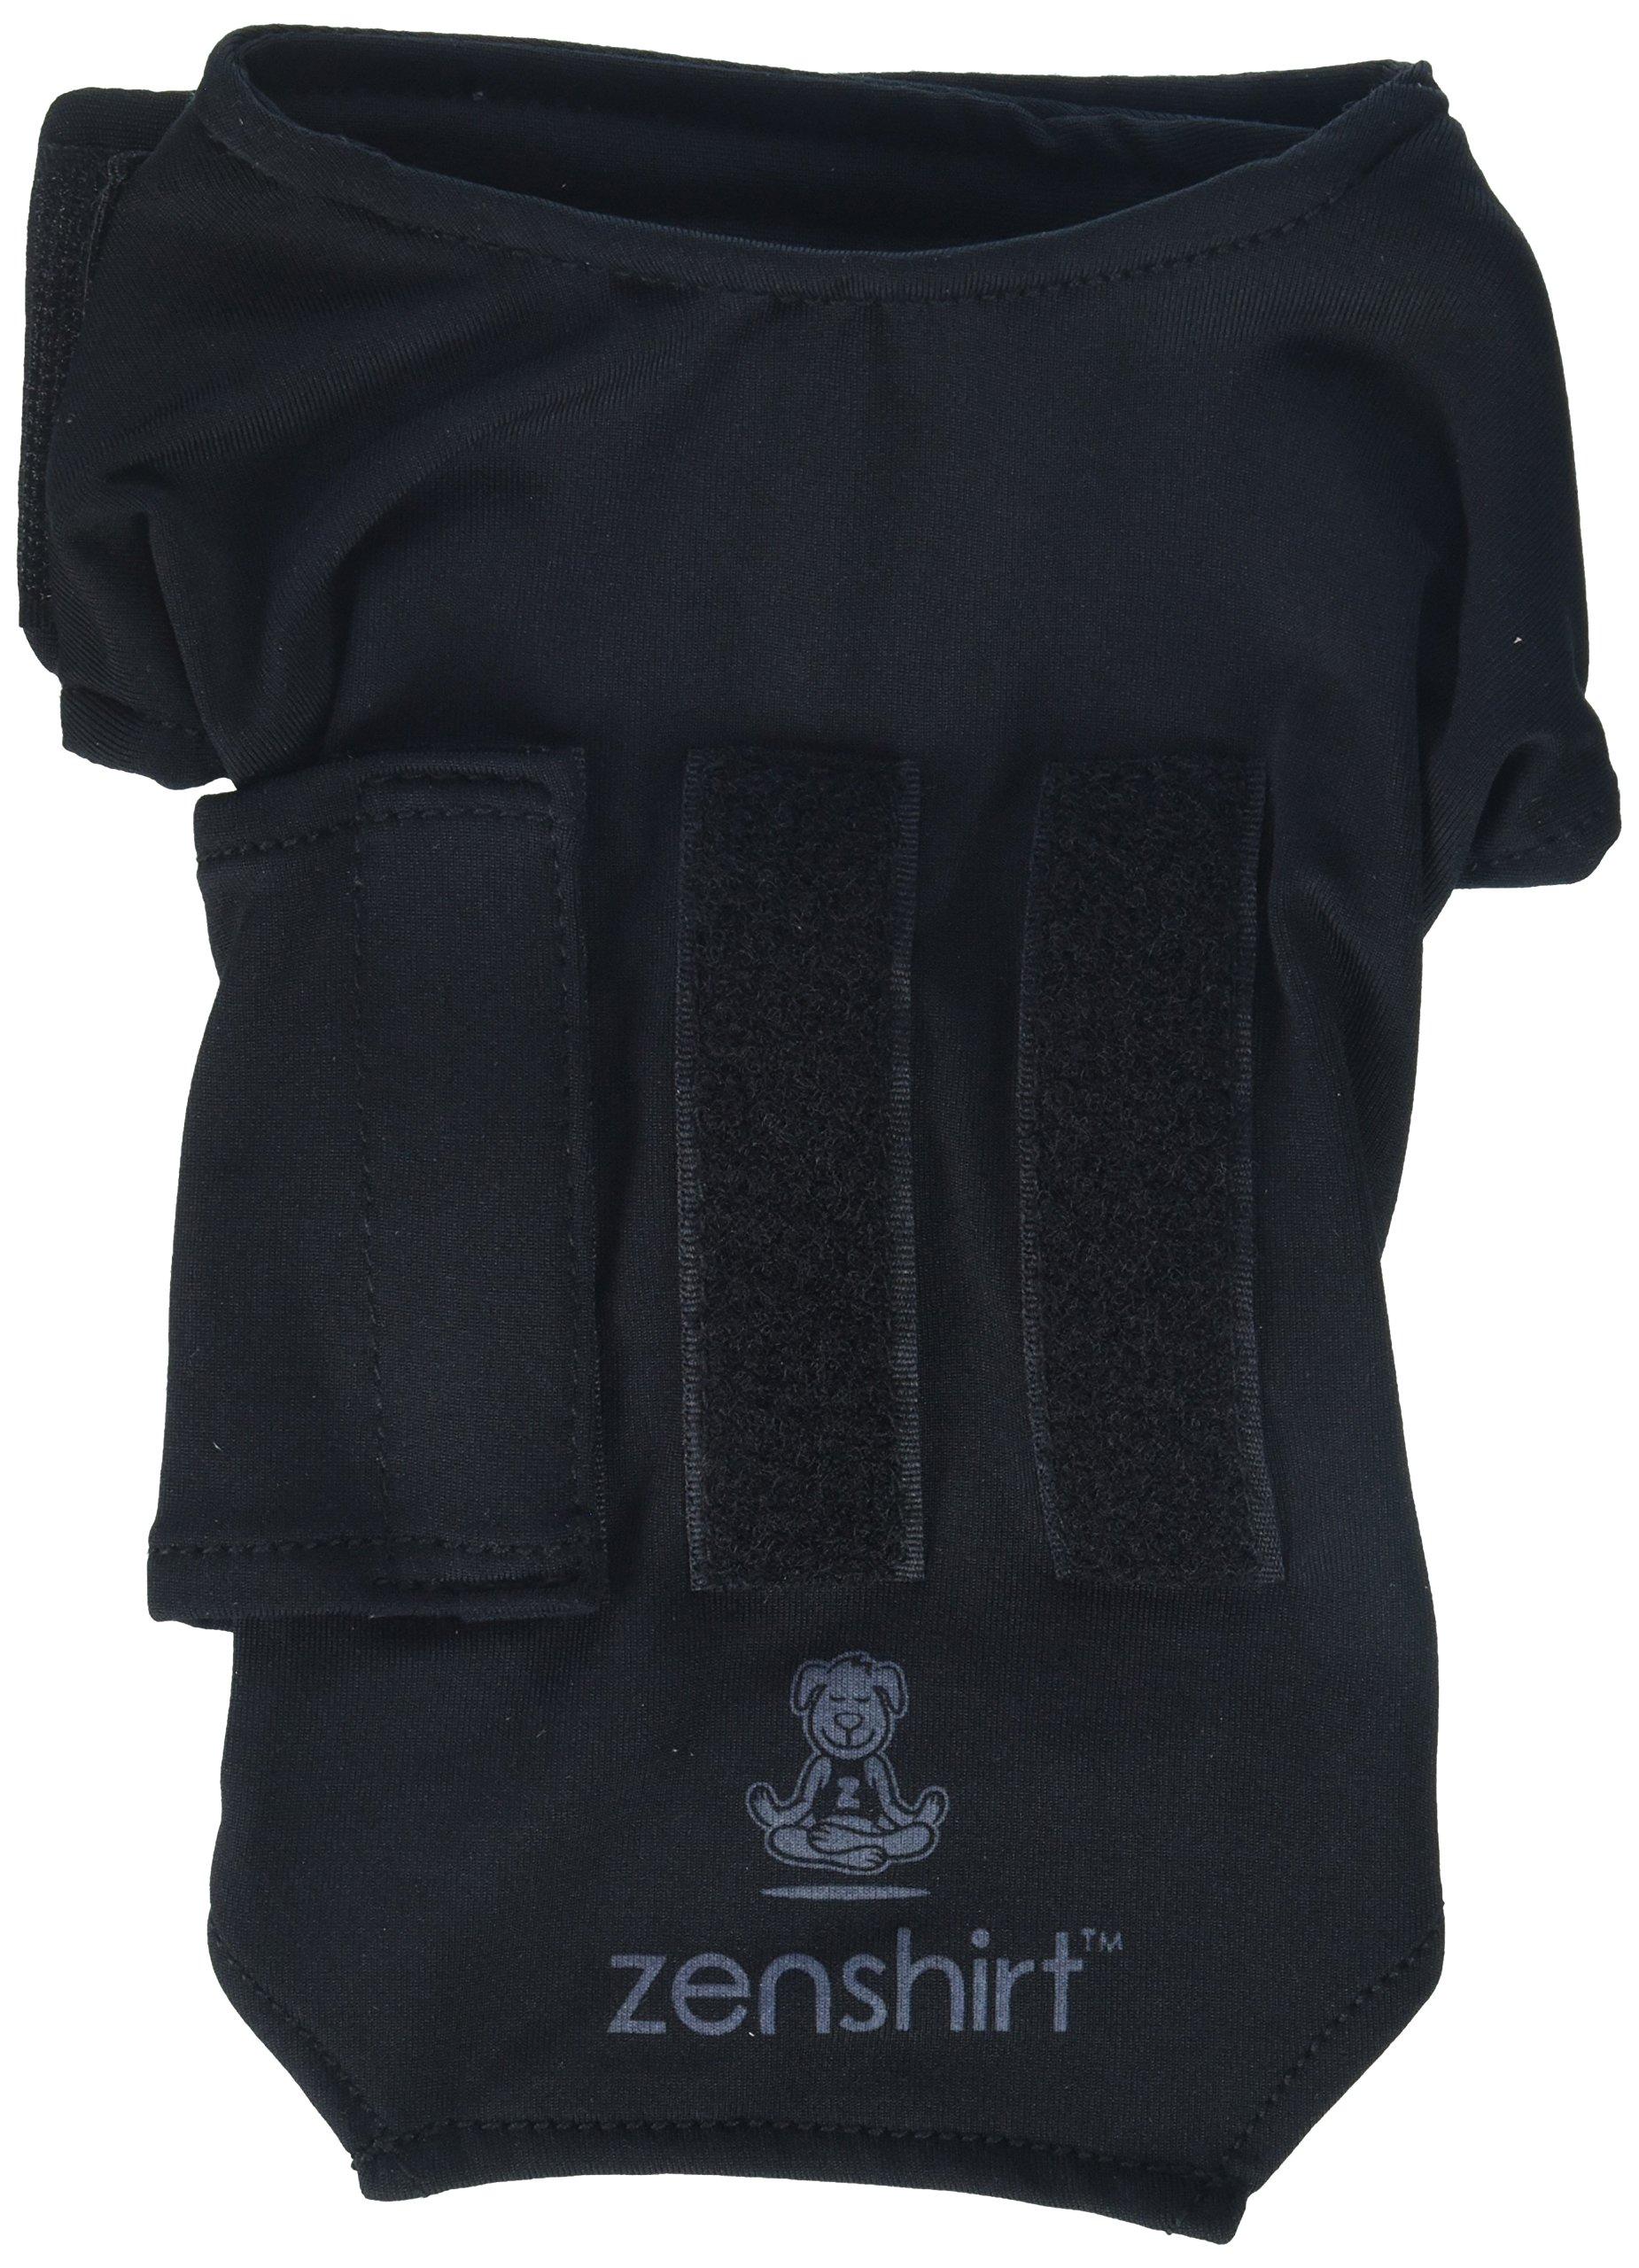 ZenPet ZenDog Anxiety Dog Vest Calming Compression Shirt X-Small